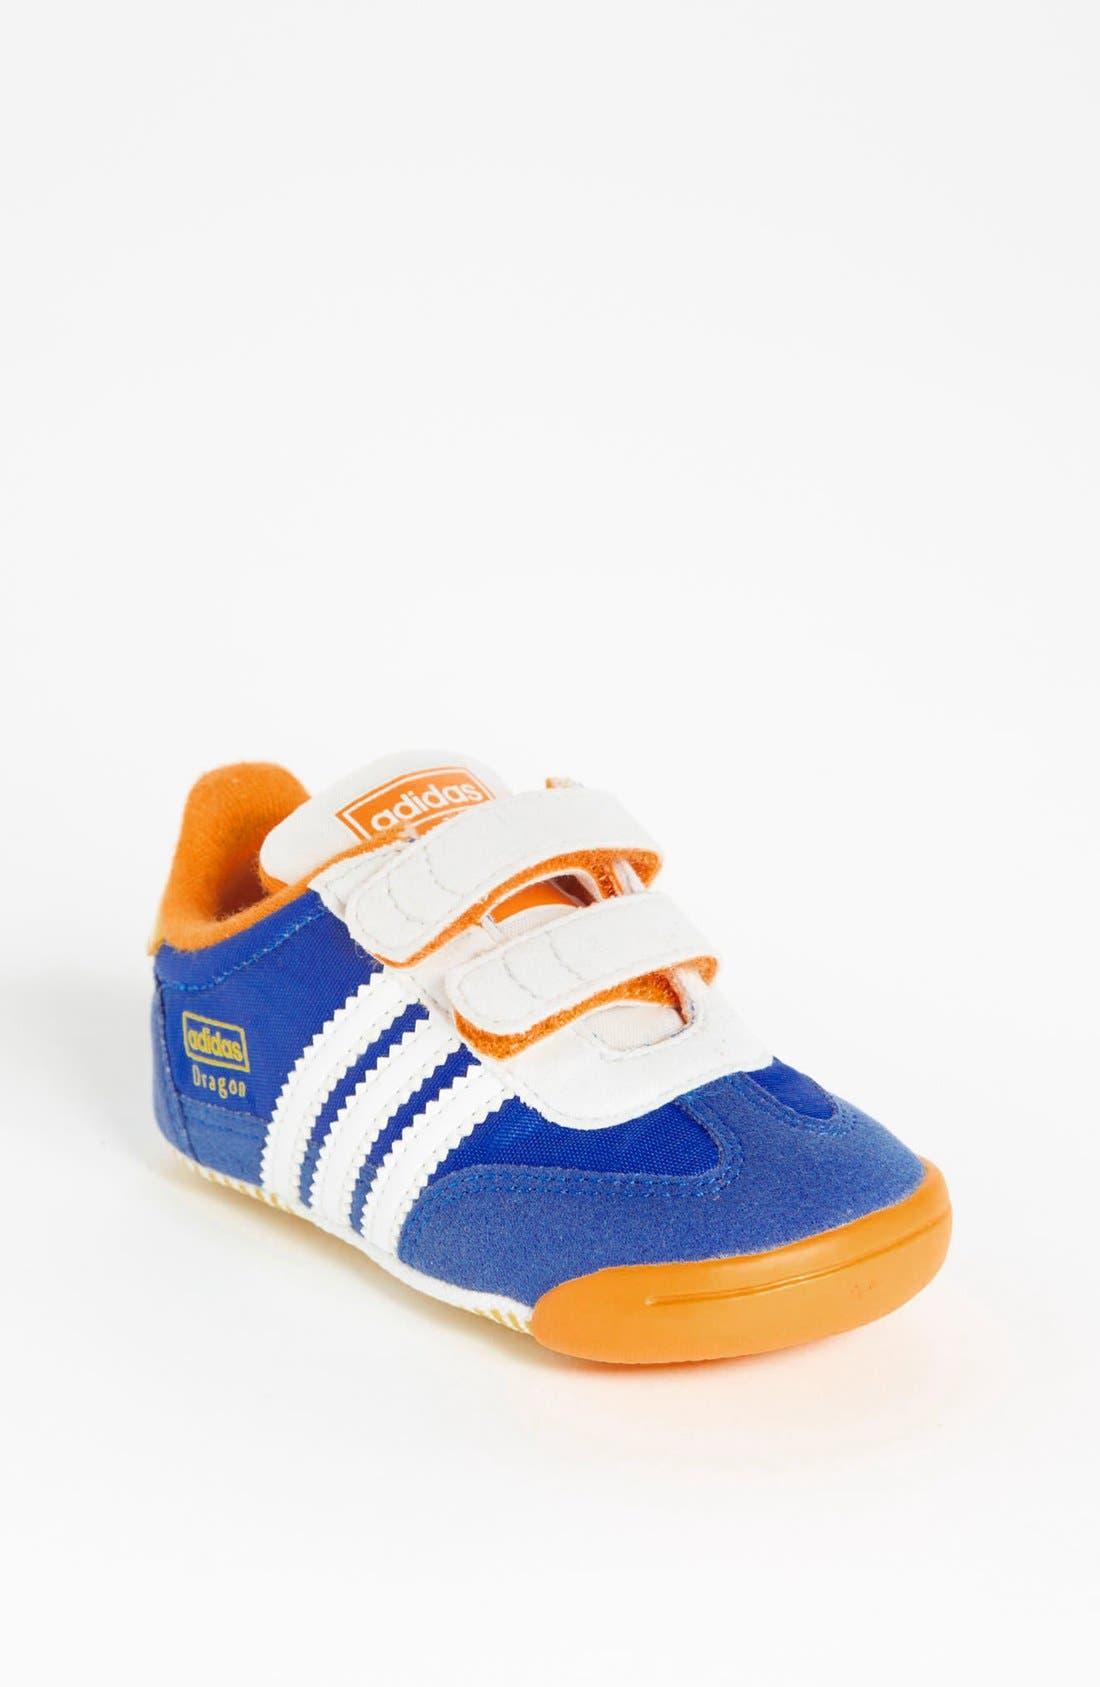 Alternate Image 1 Selected - adidas 'Learn To Walk - Dragon' Crib Sneaker (Baby)